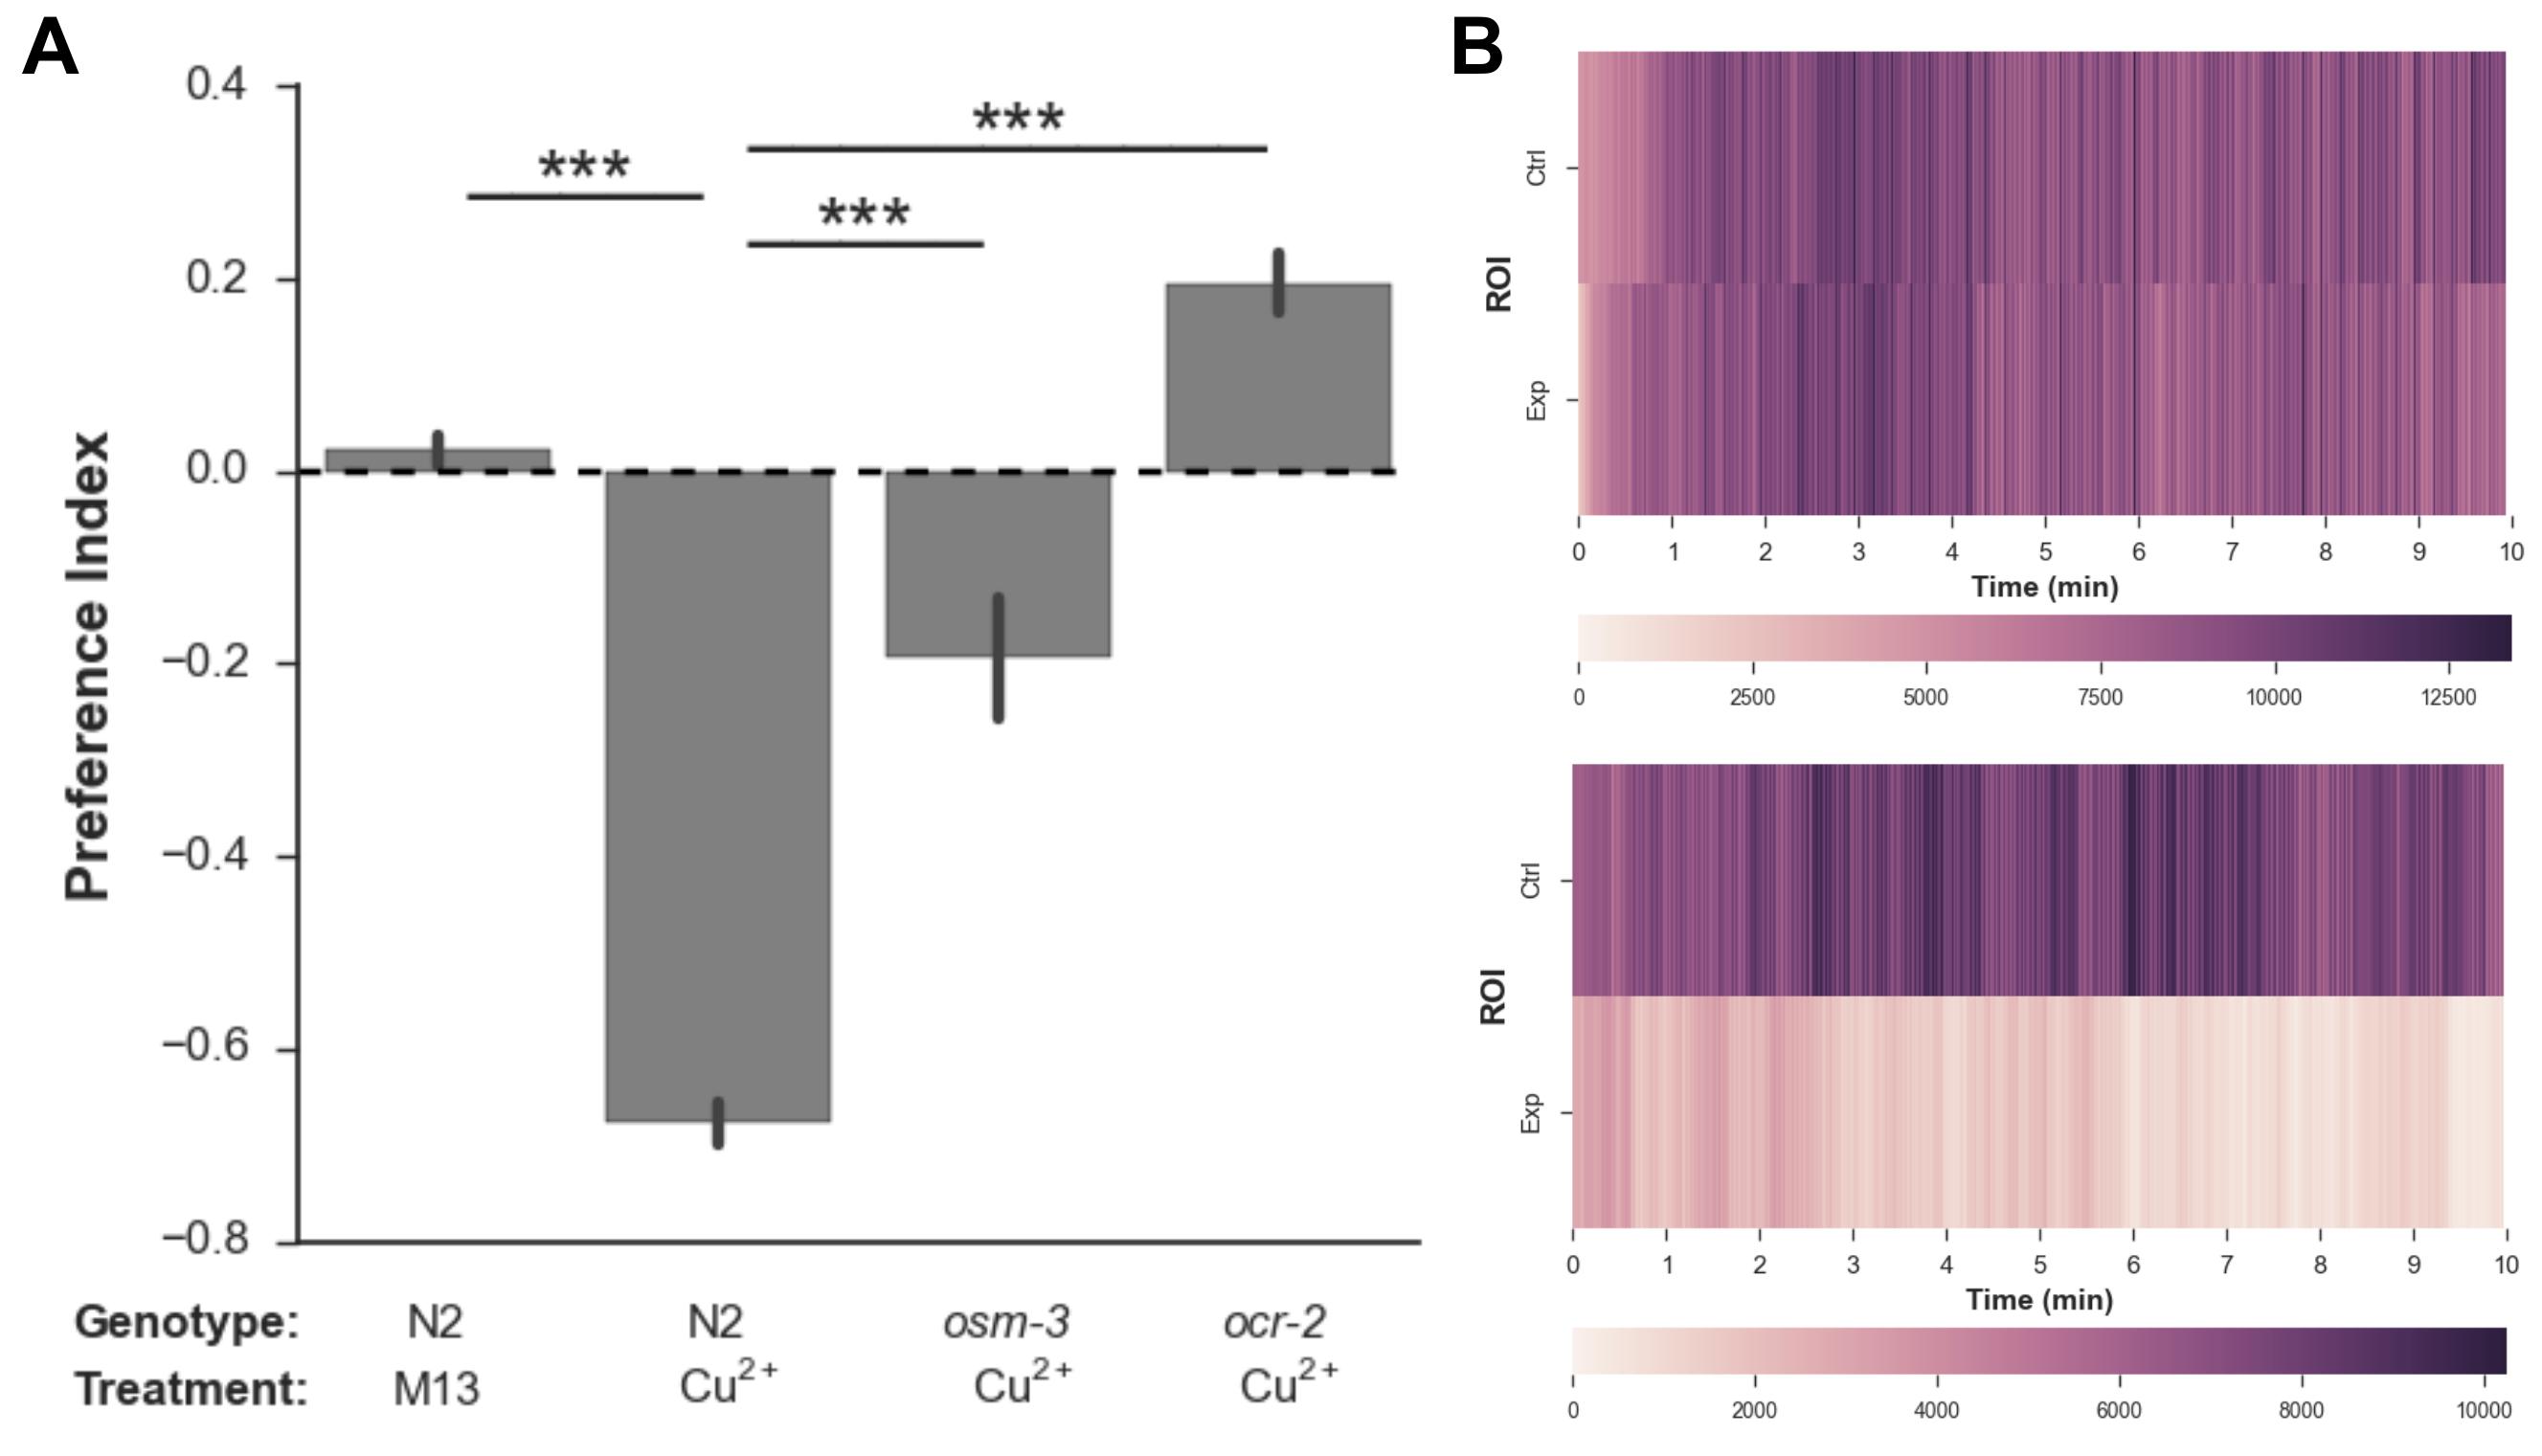 Automated Analysis of a Nematode Population-based